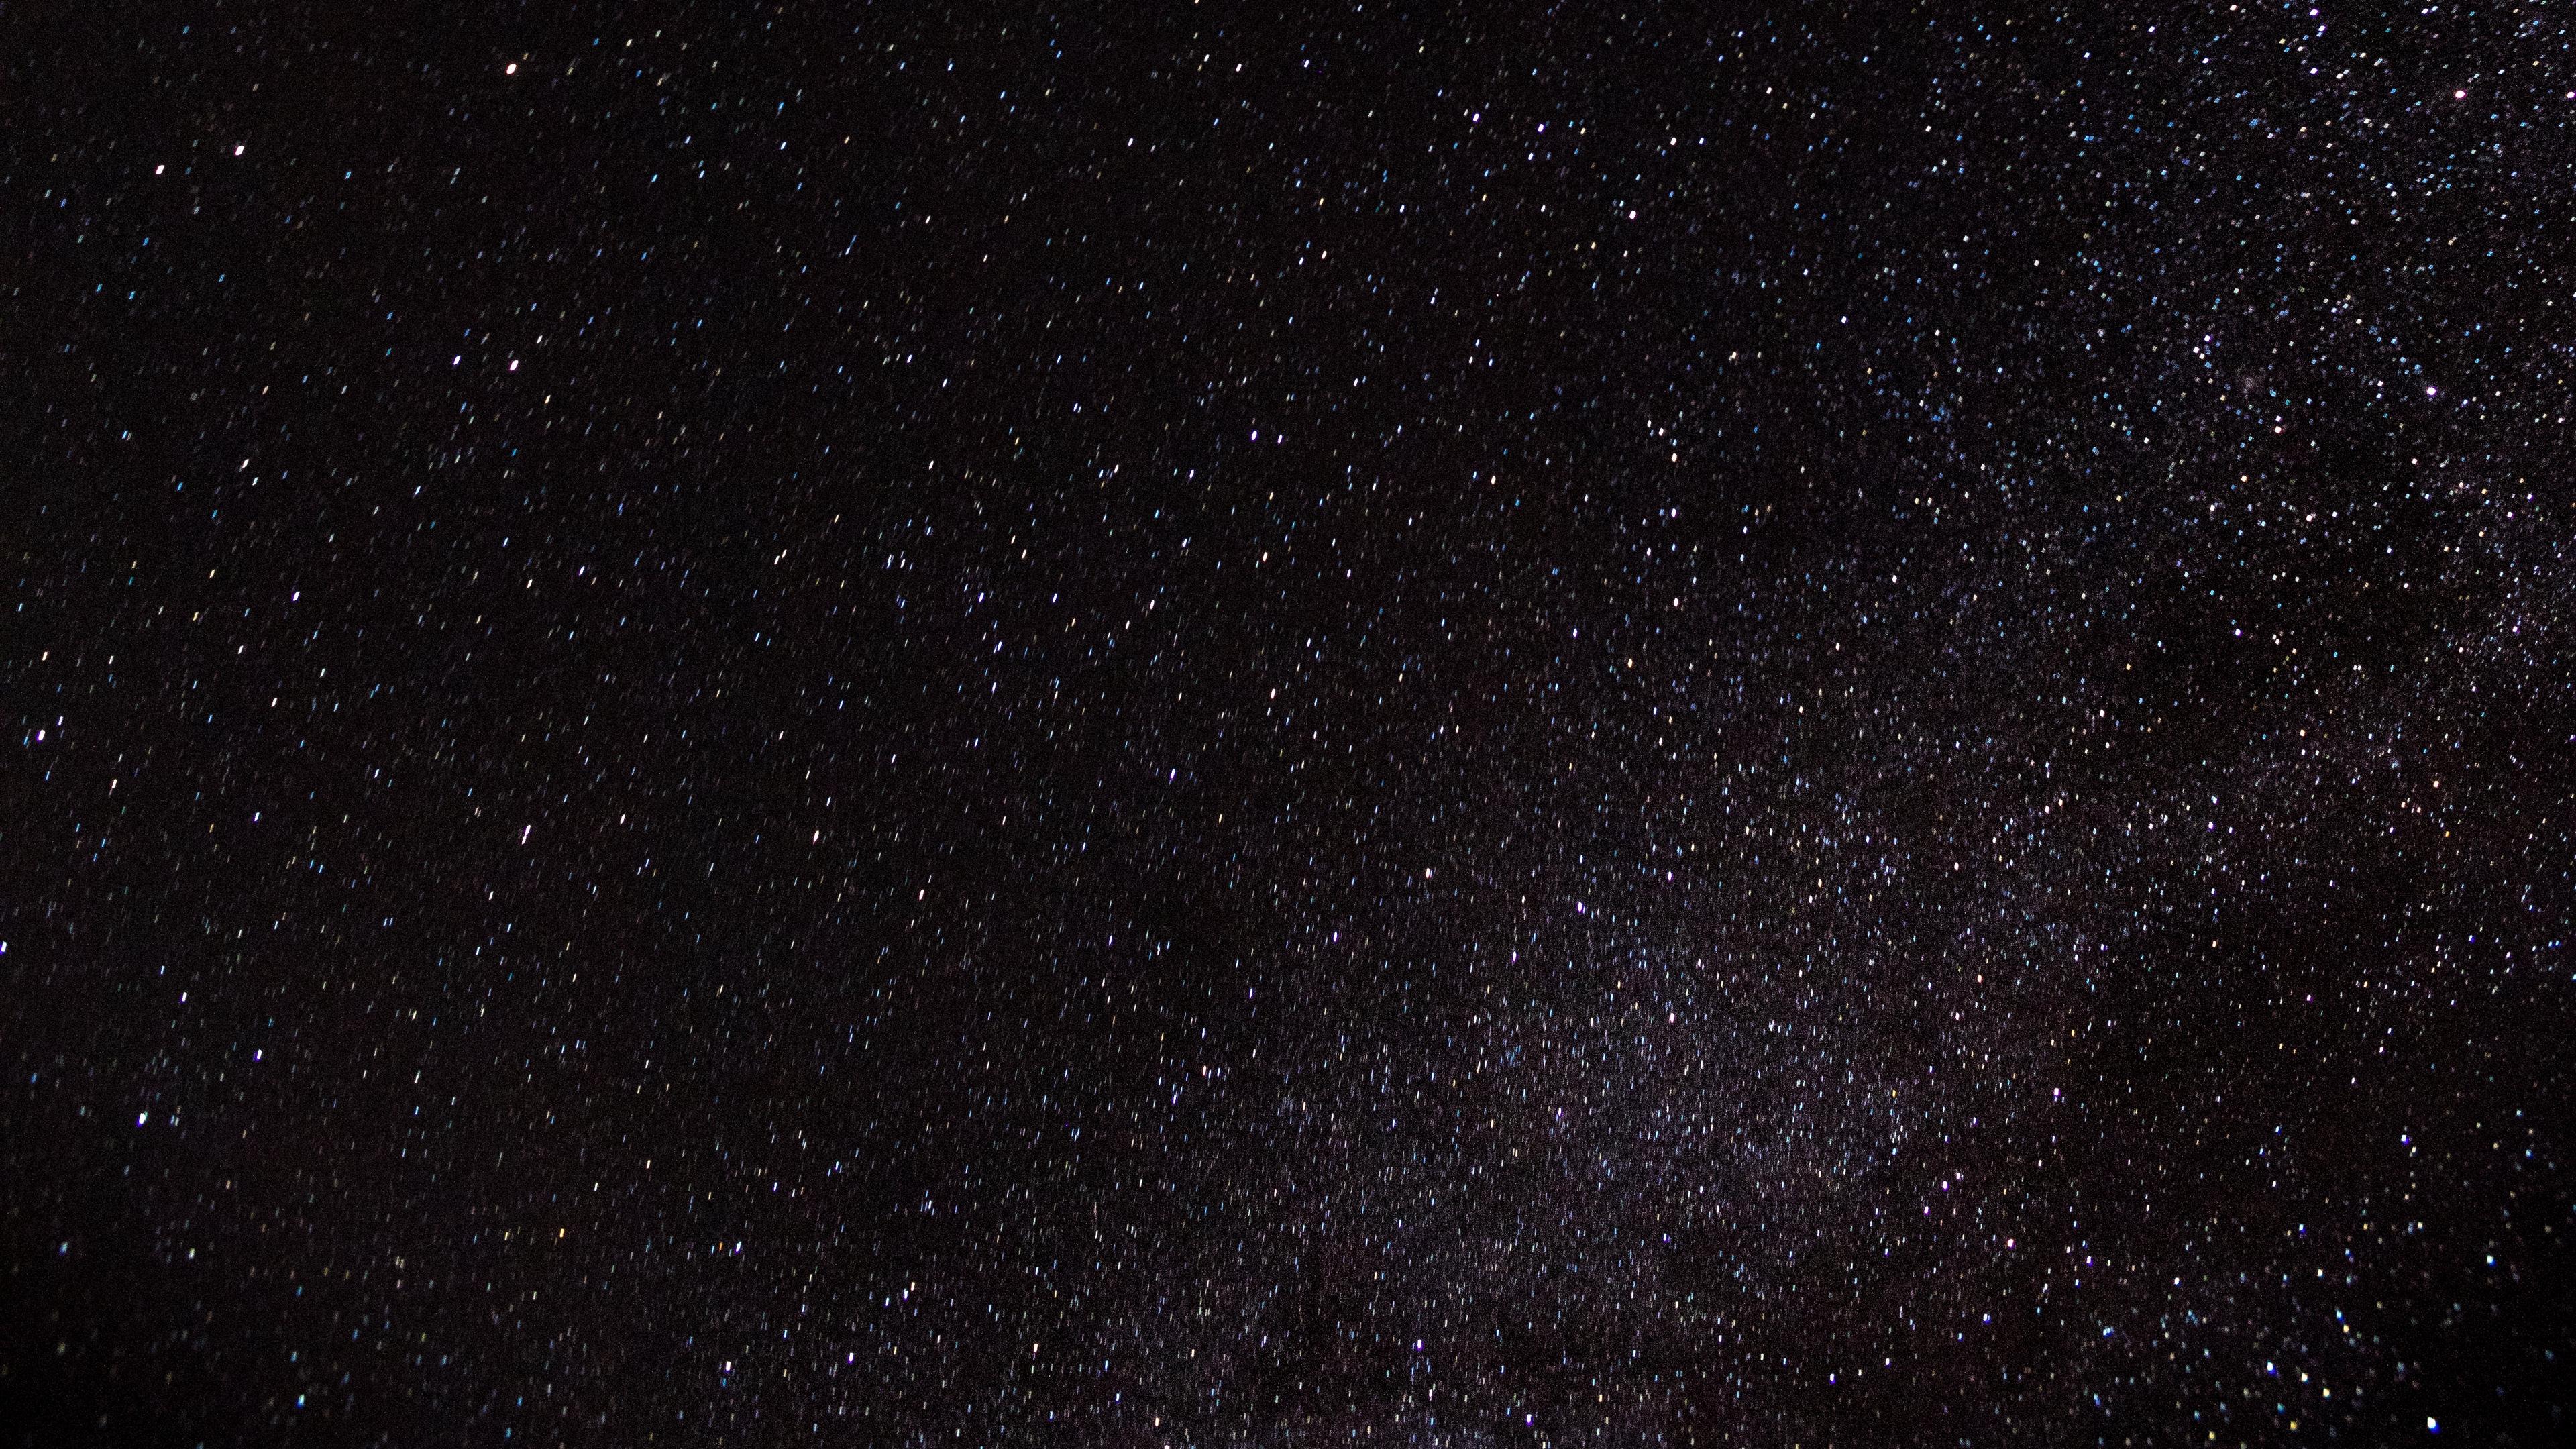 starry sky stars night glitter dark 4k 1536016633 - starry sky, stars, night, glitter, dark 4k - Stars, starry sky, Night